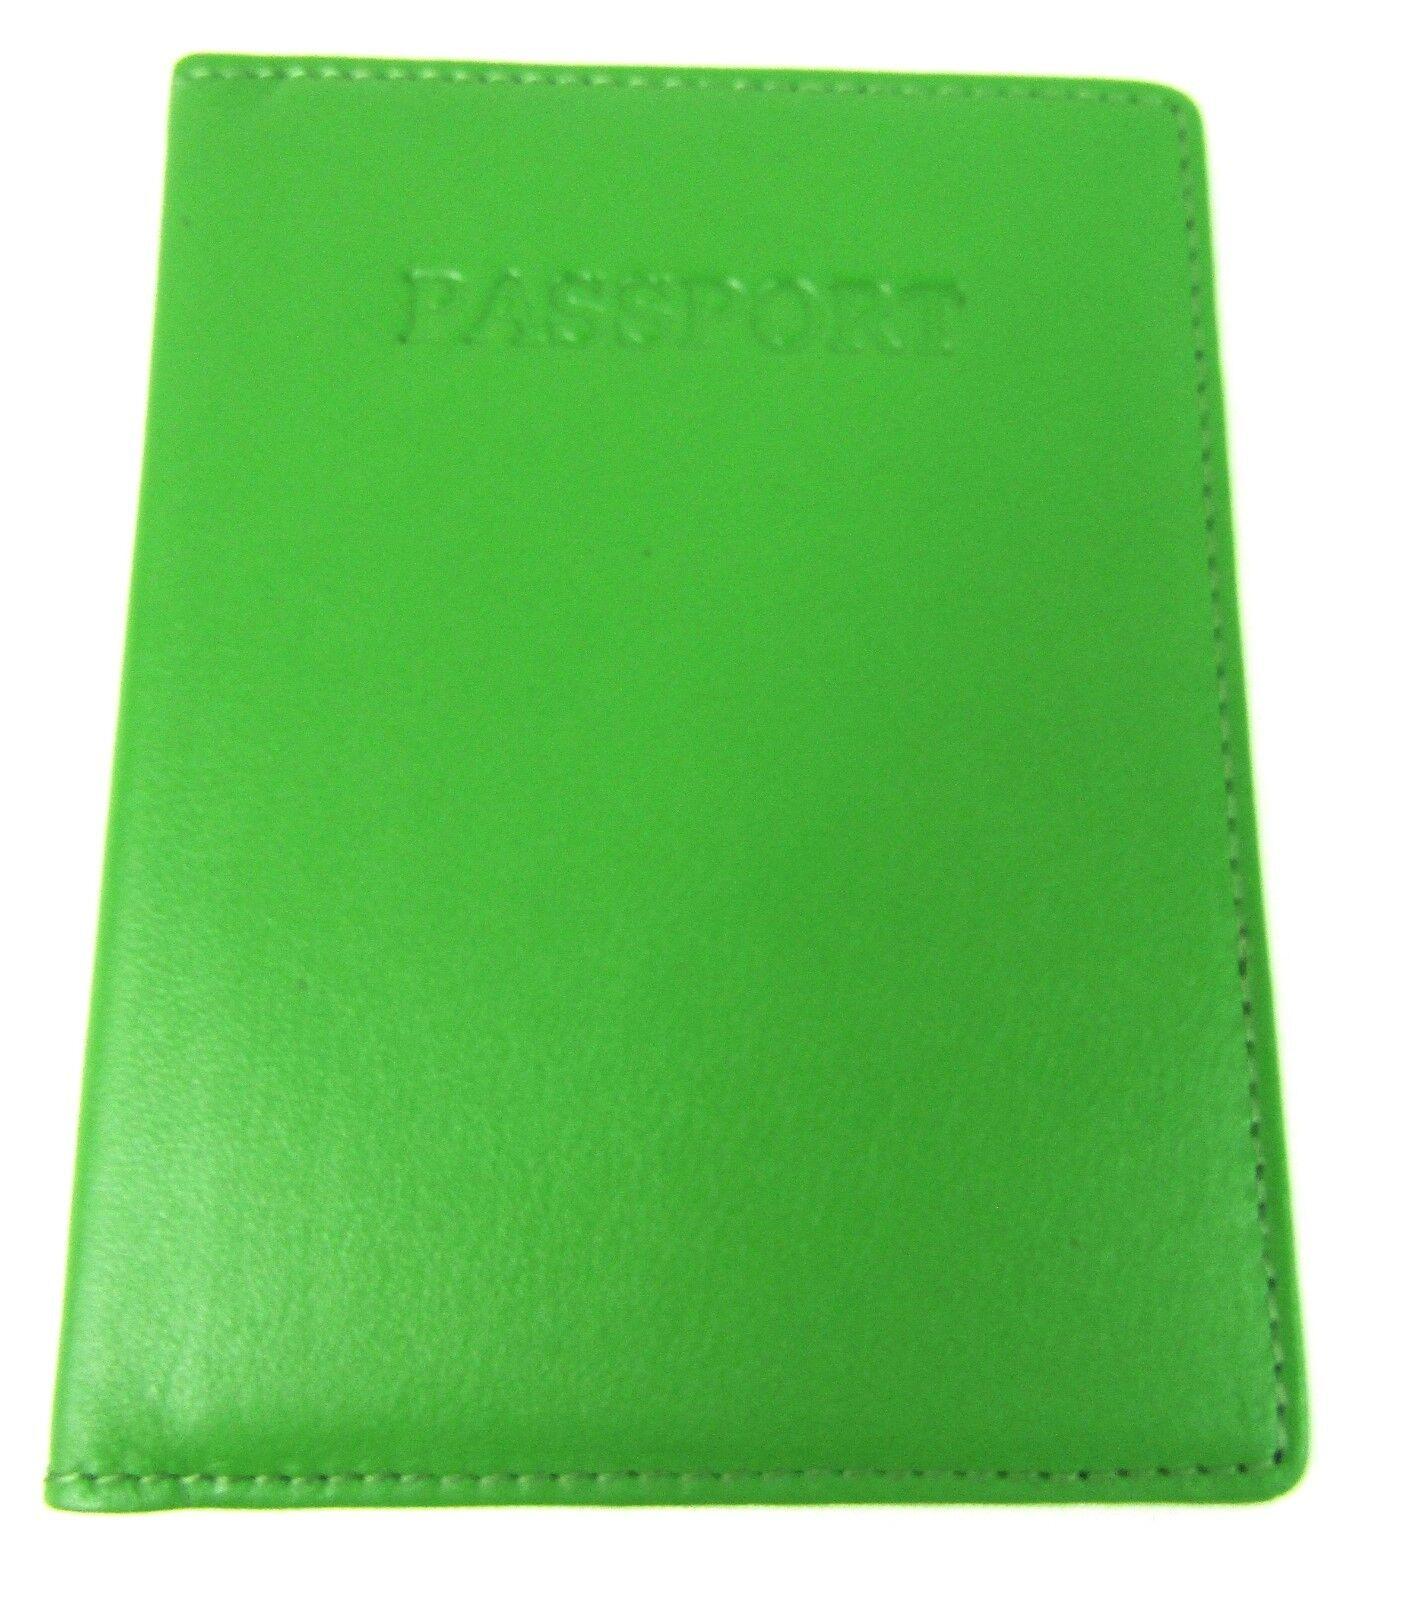 Genuine Leather Passport Holder Travel Wallet Documents Folder Rfid Protected